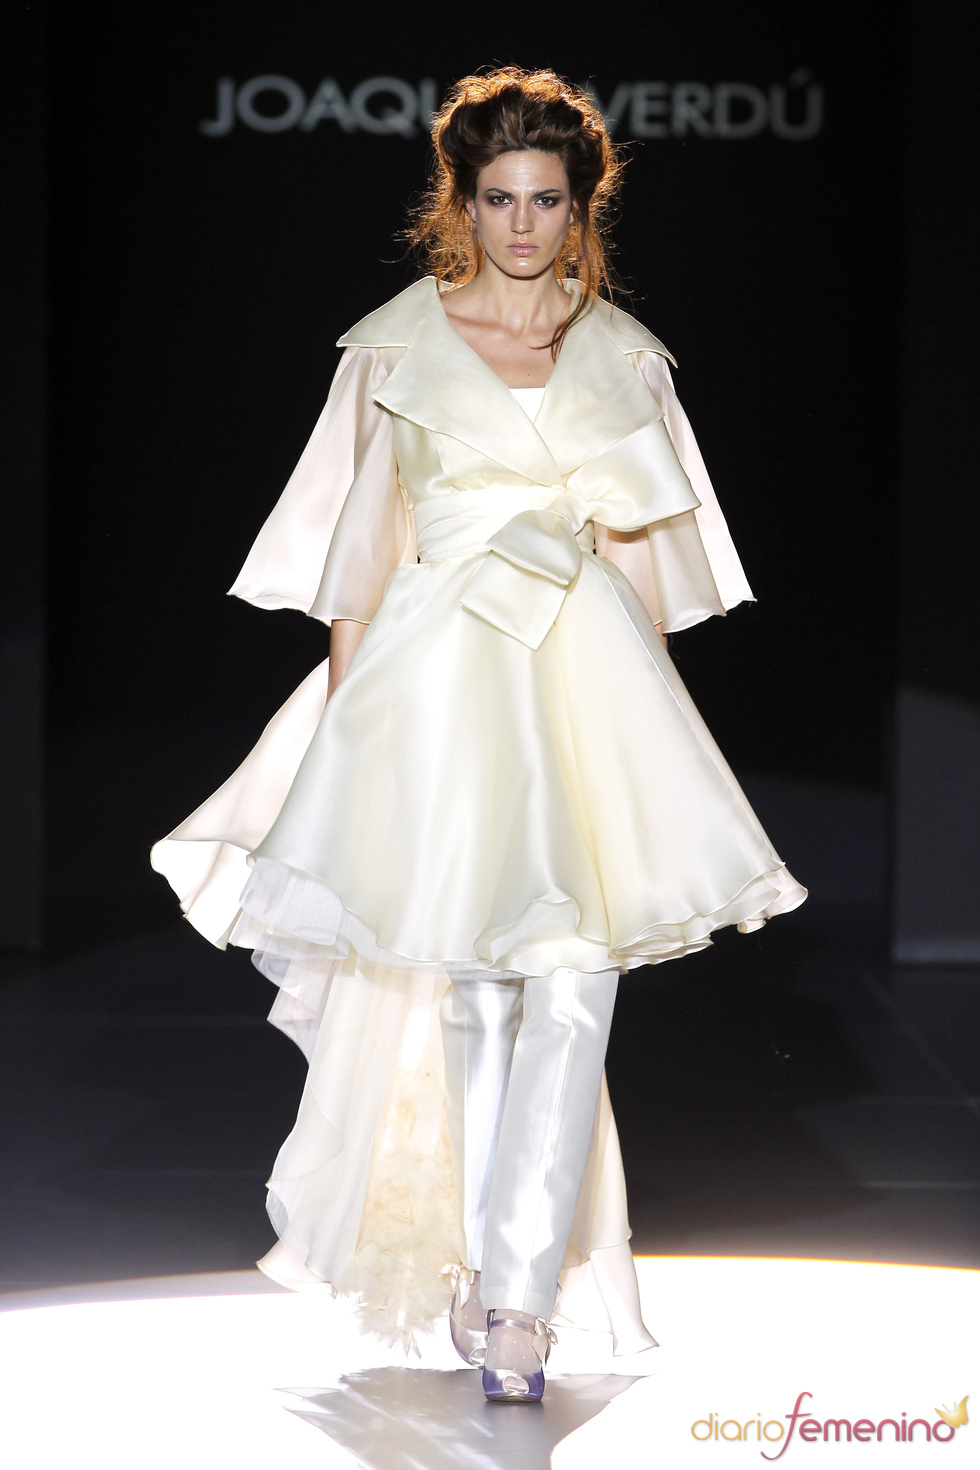 Joaquim Verdú: colección de novia 2011